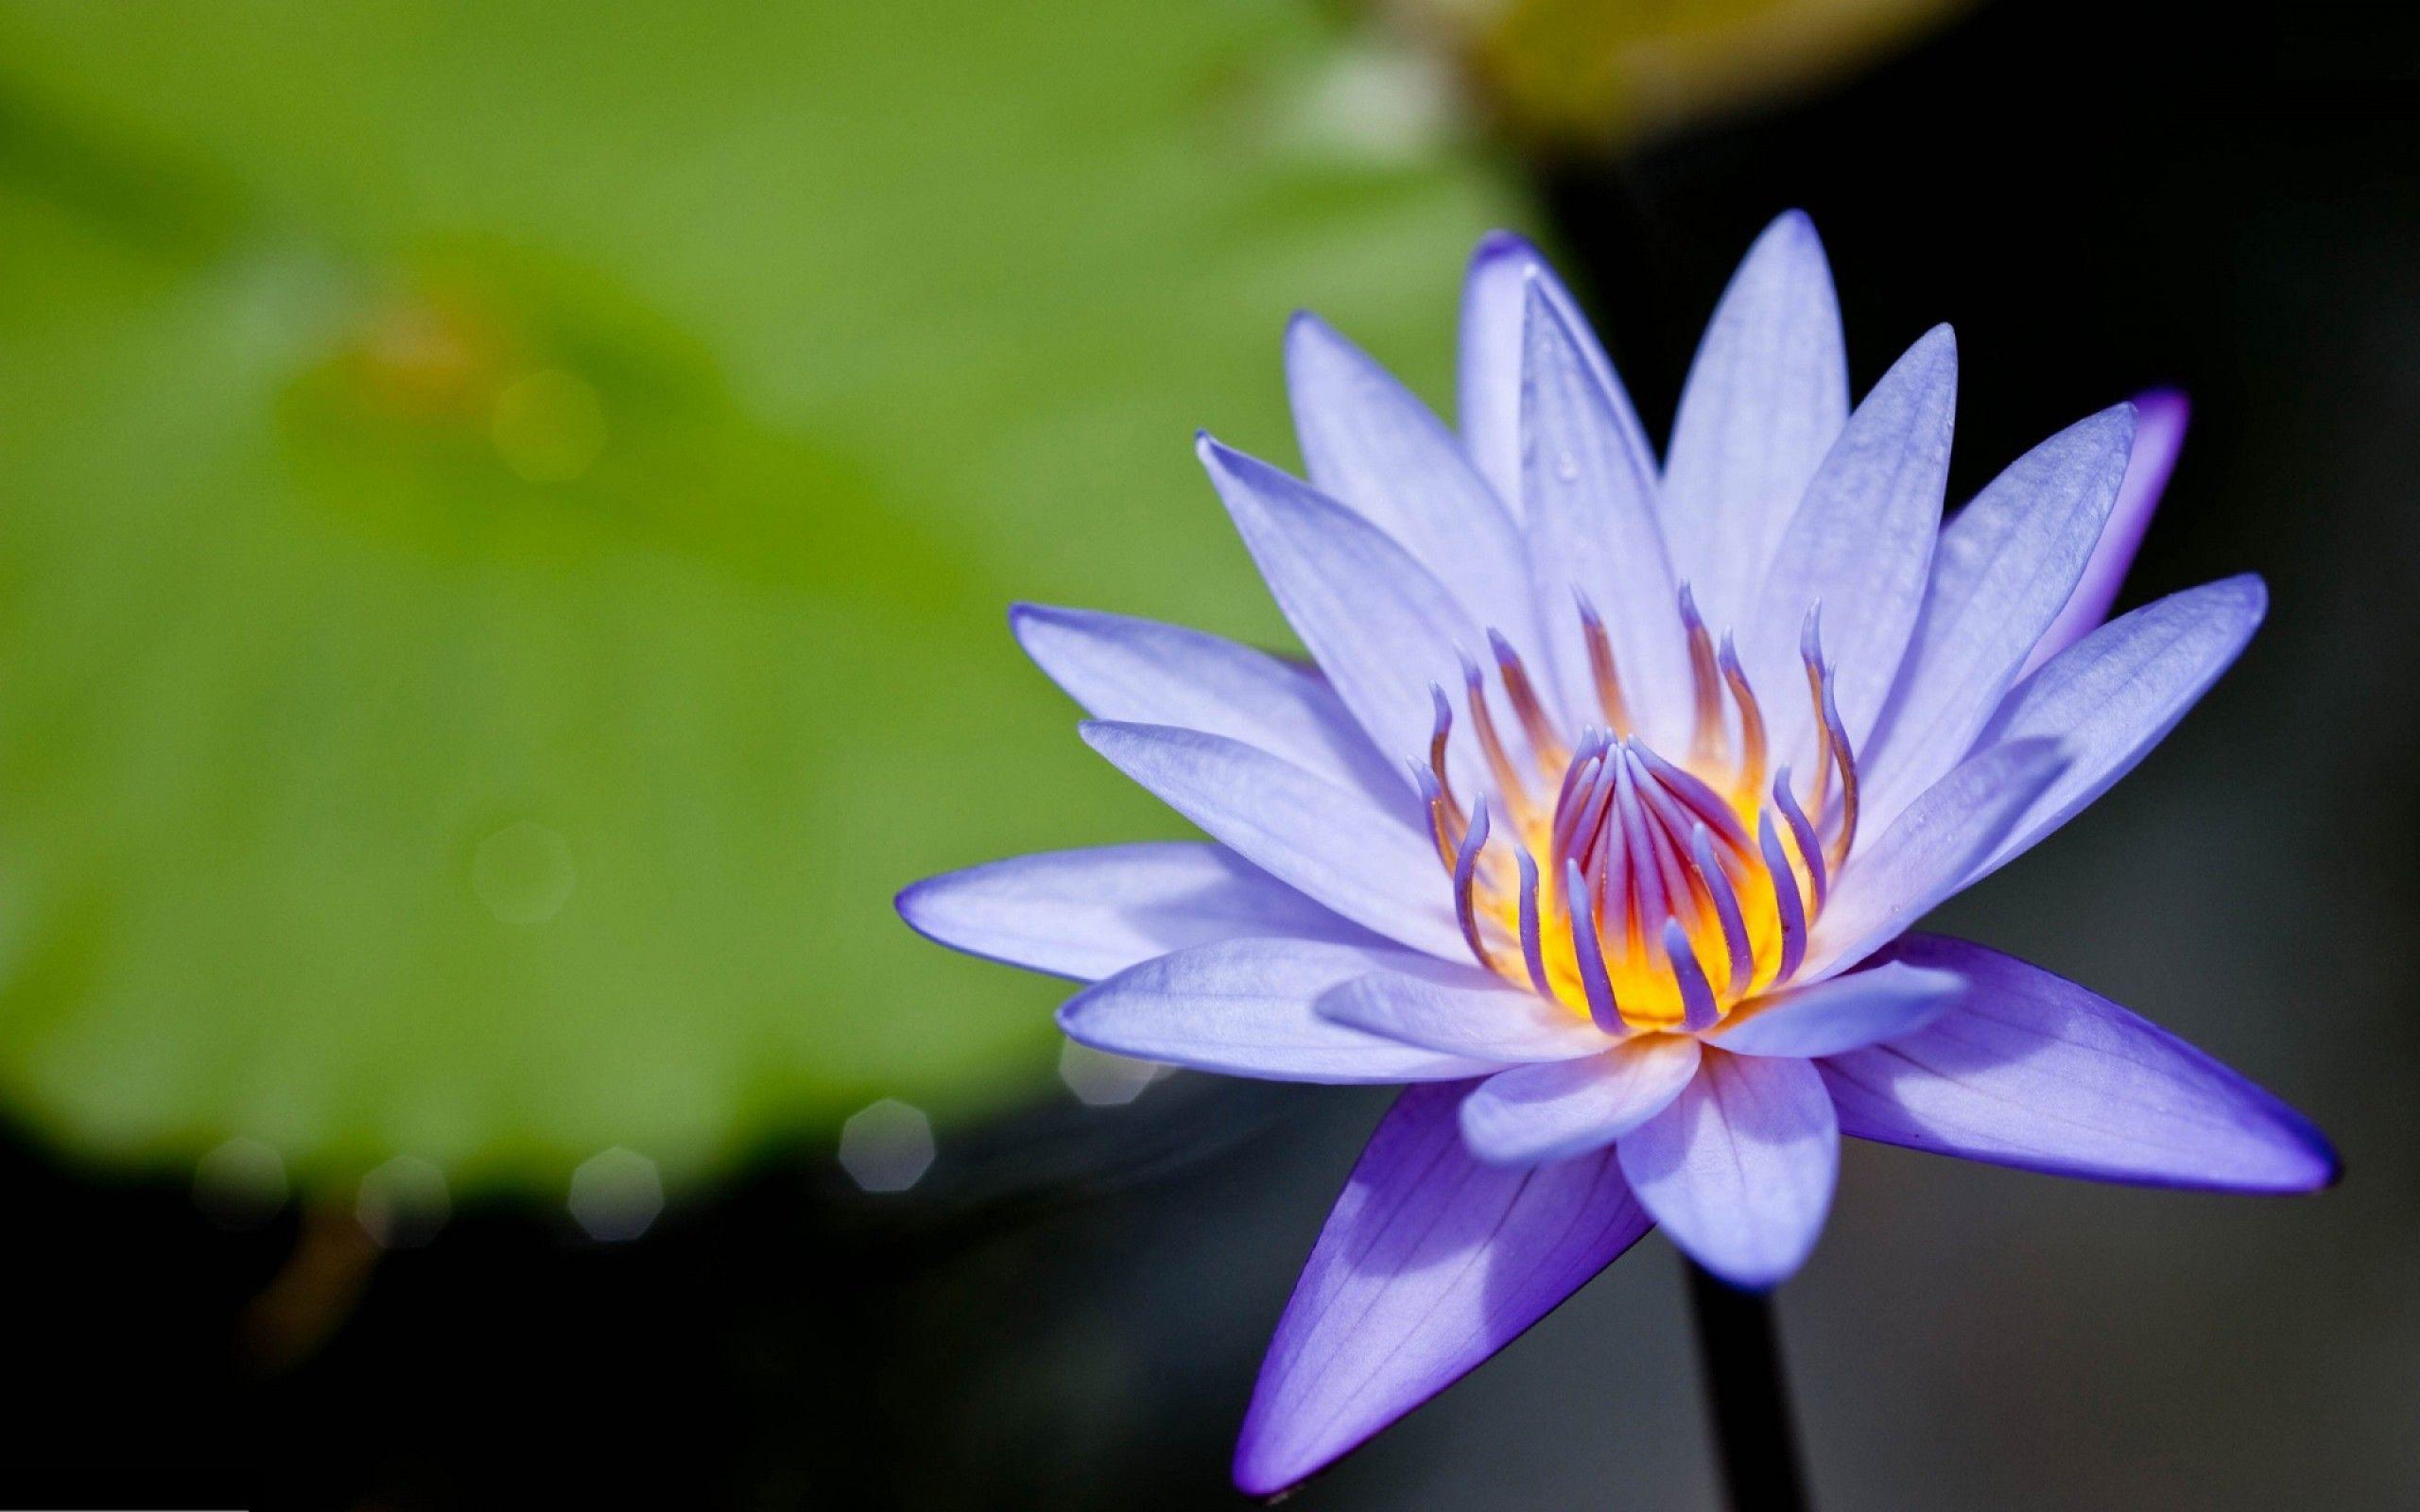 Amazing Purple Lotus Flower Desktop Backgrounds Download Free ...